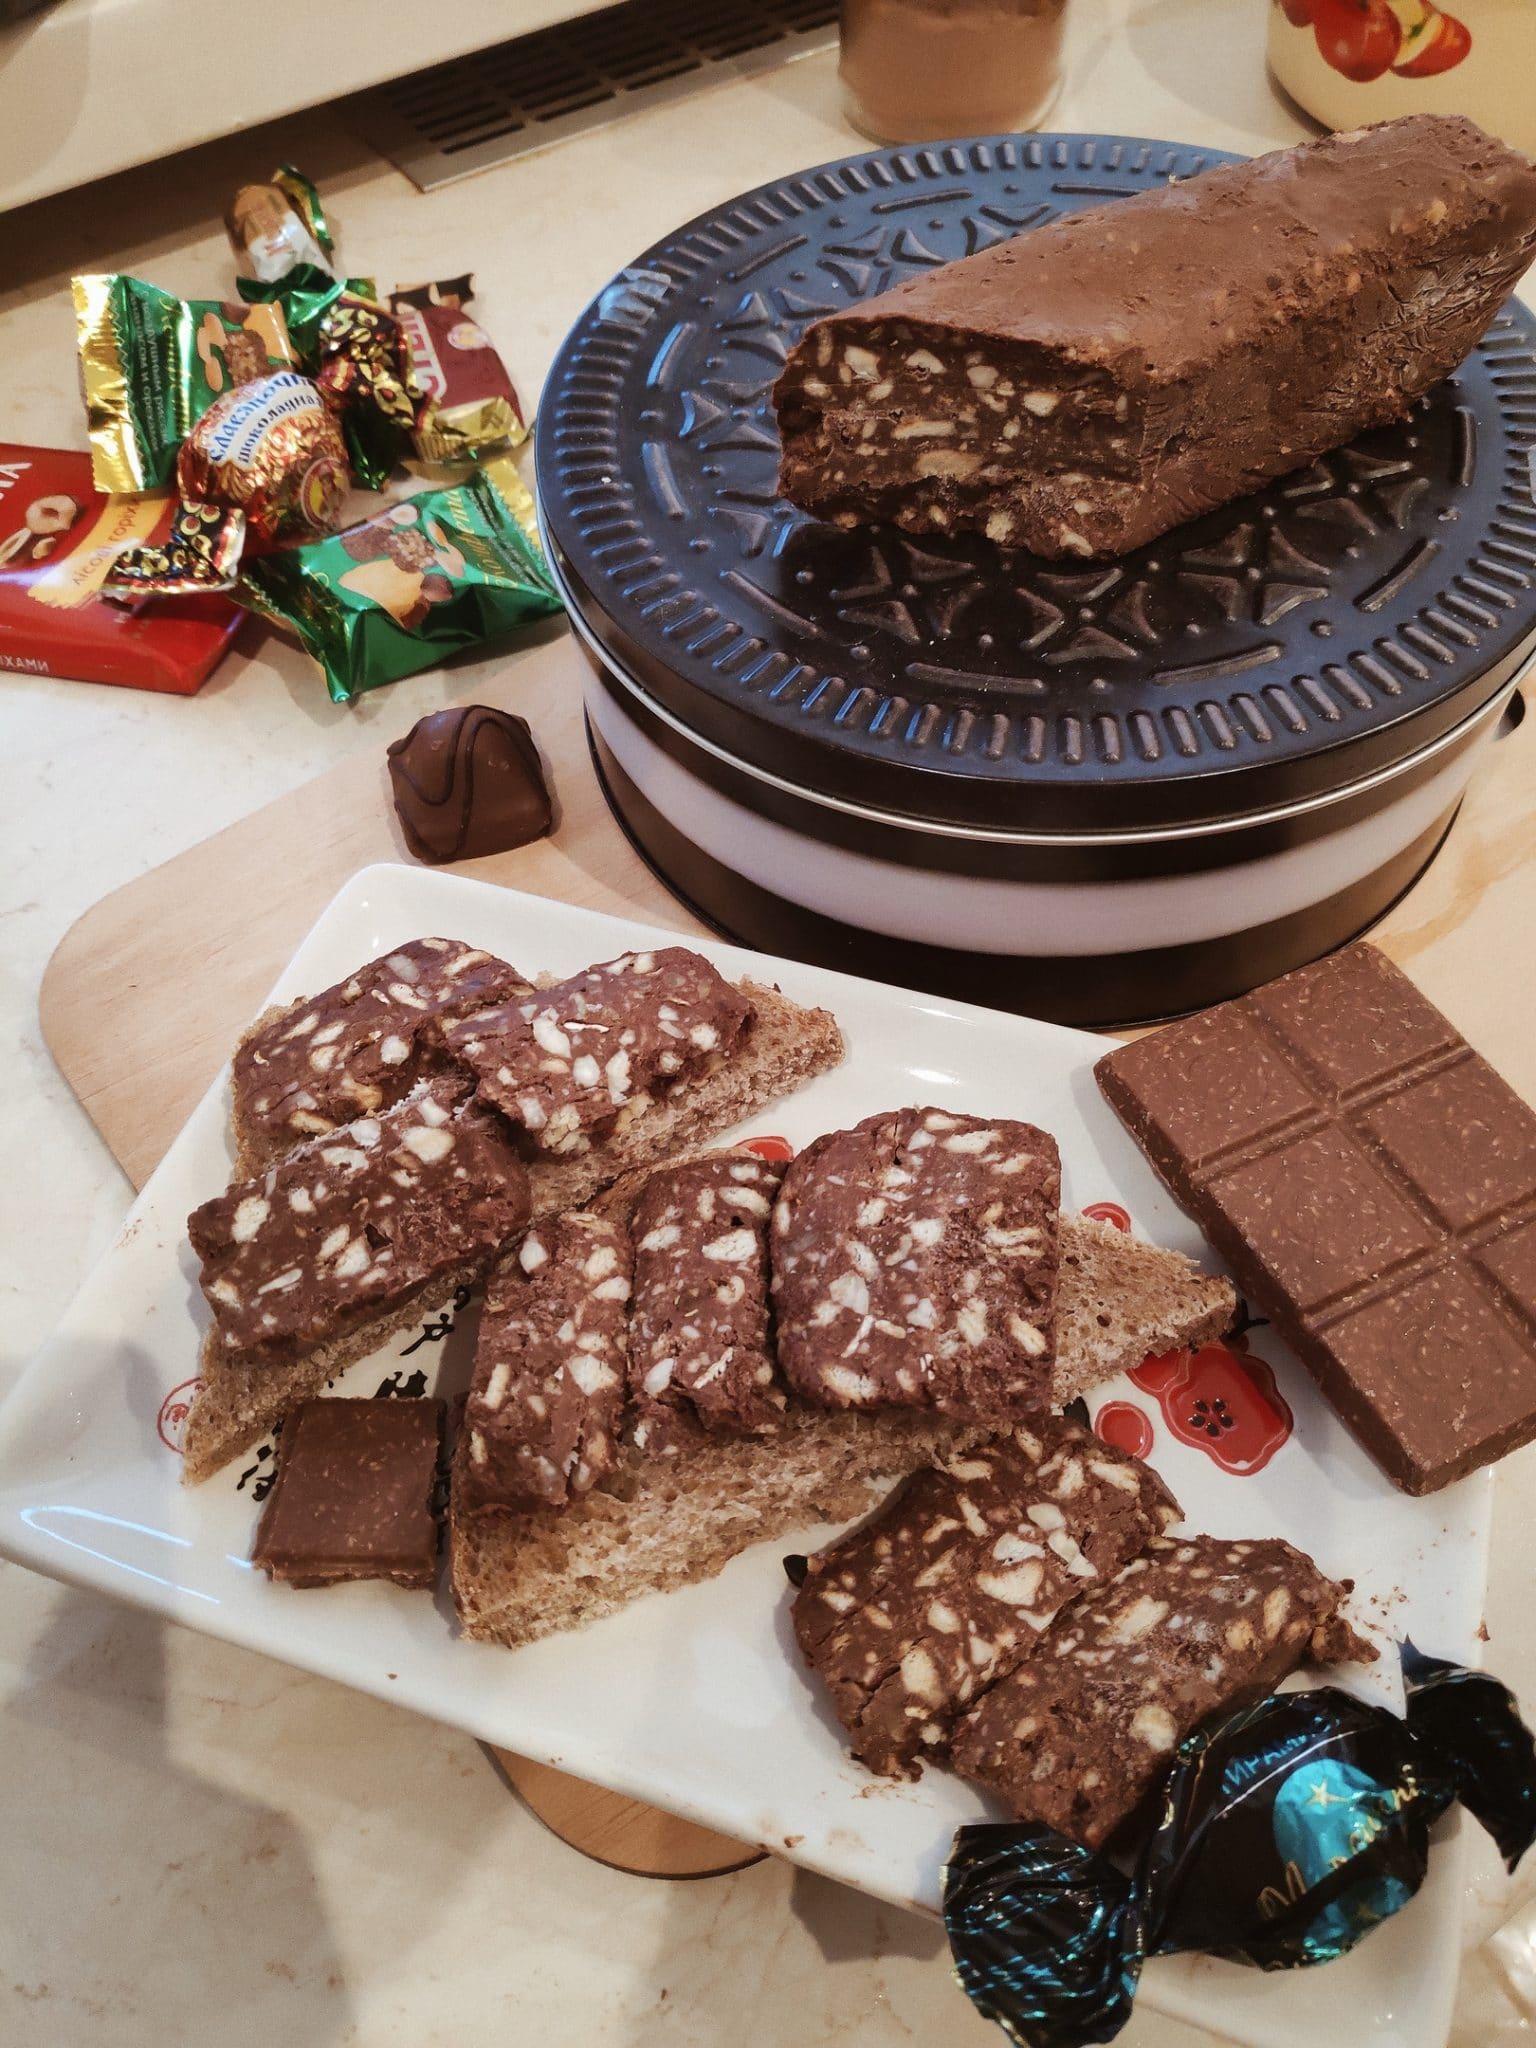 блюда из шоколада рецепты с фото